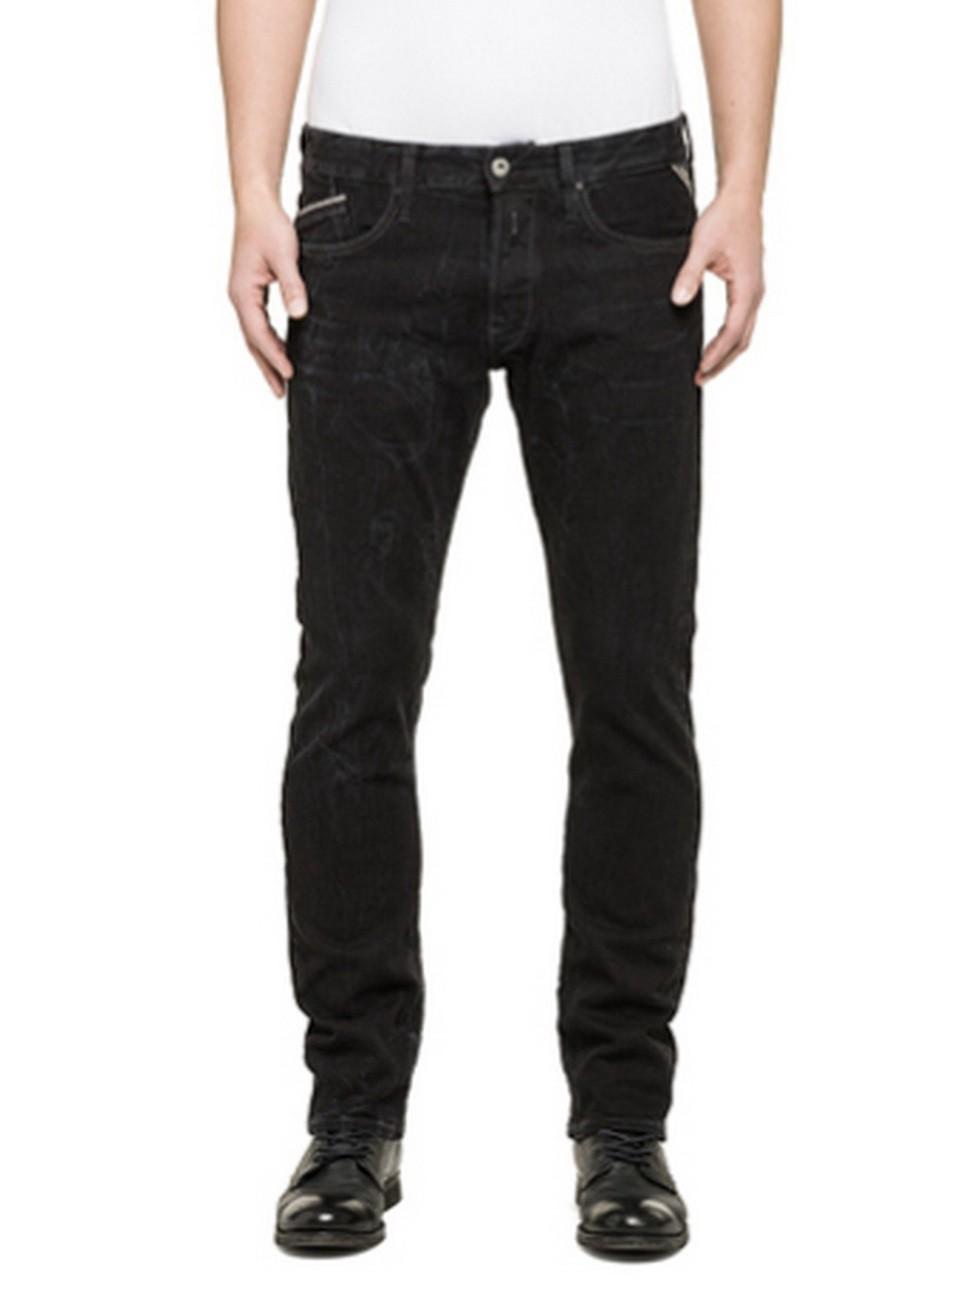 replay herren jeans waitom regular fit black kaufen jeans direct de. Black Bedroom Furniture Sets. Home Design Ideas